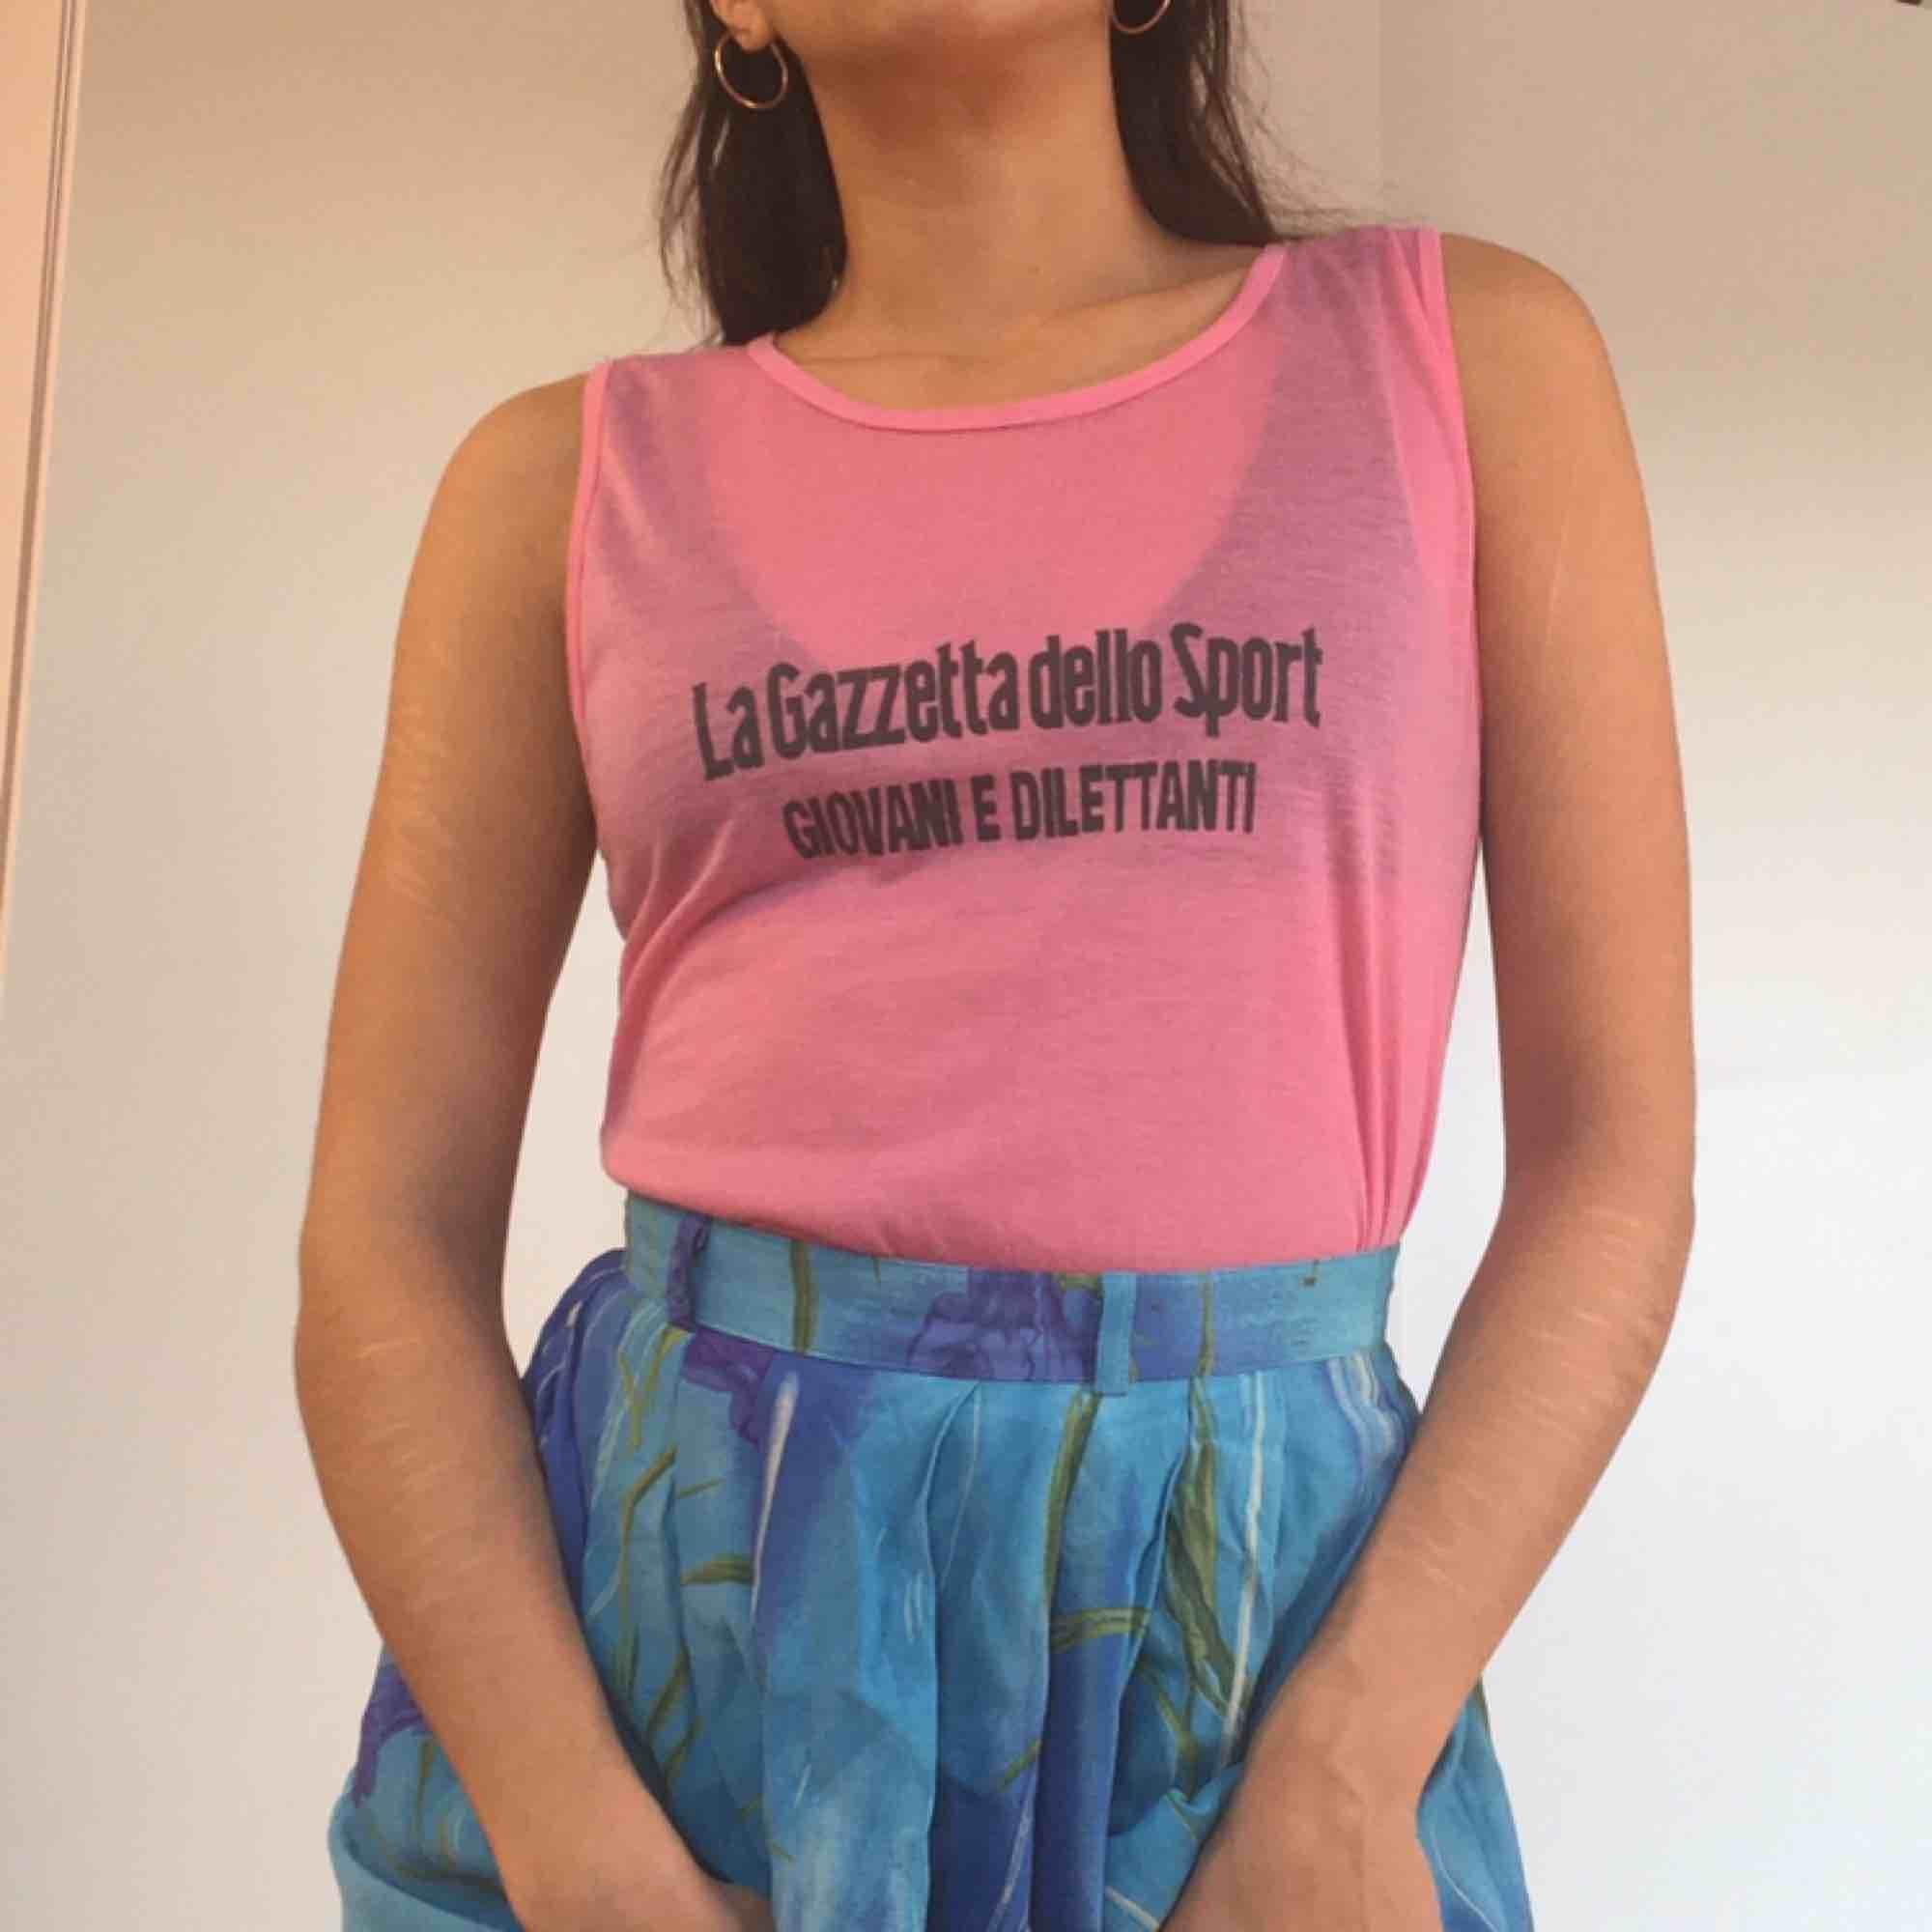 Rosa linne i polyester.  (っ◔◡◔)っ MÅTT: Byst: 42cm Längd: 50cm. Toppar.